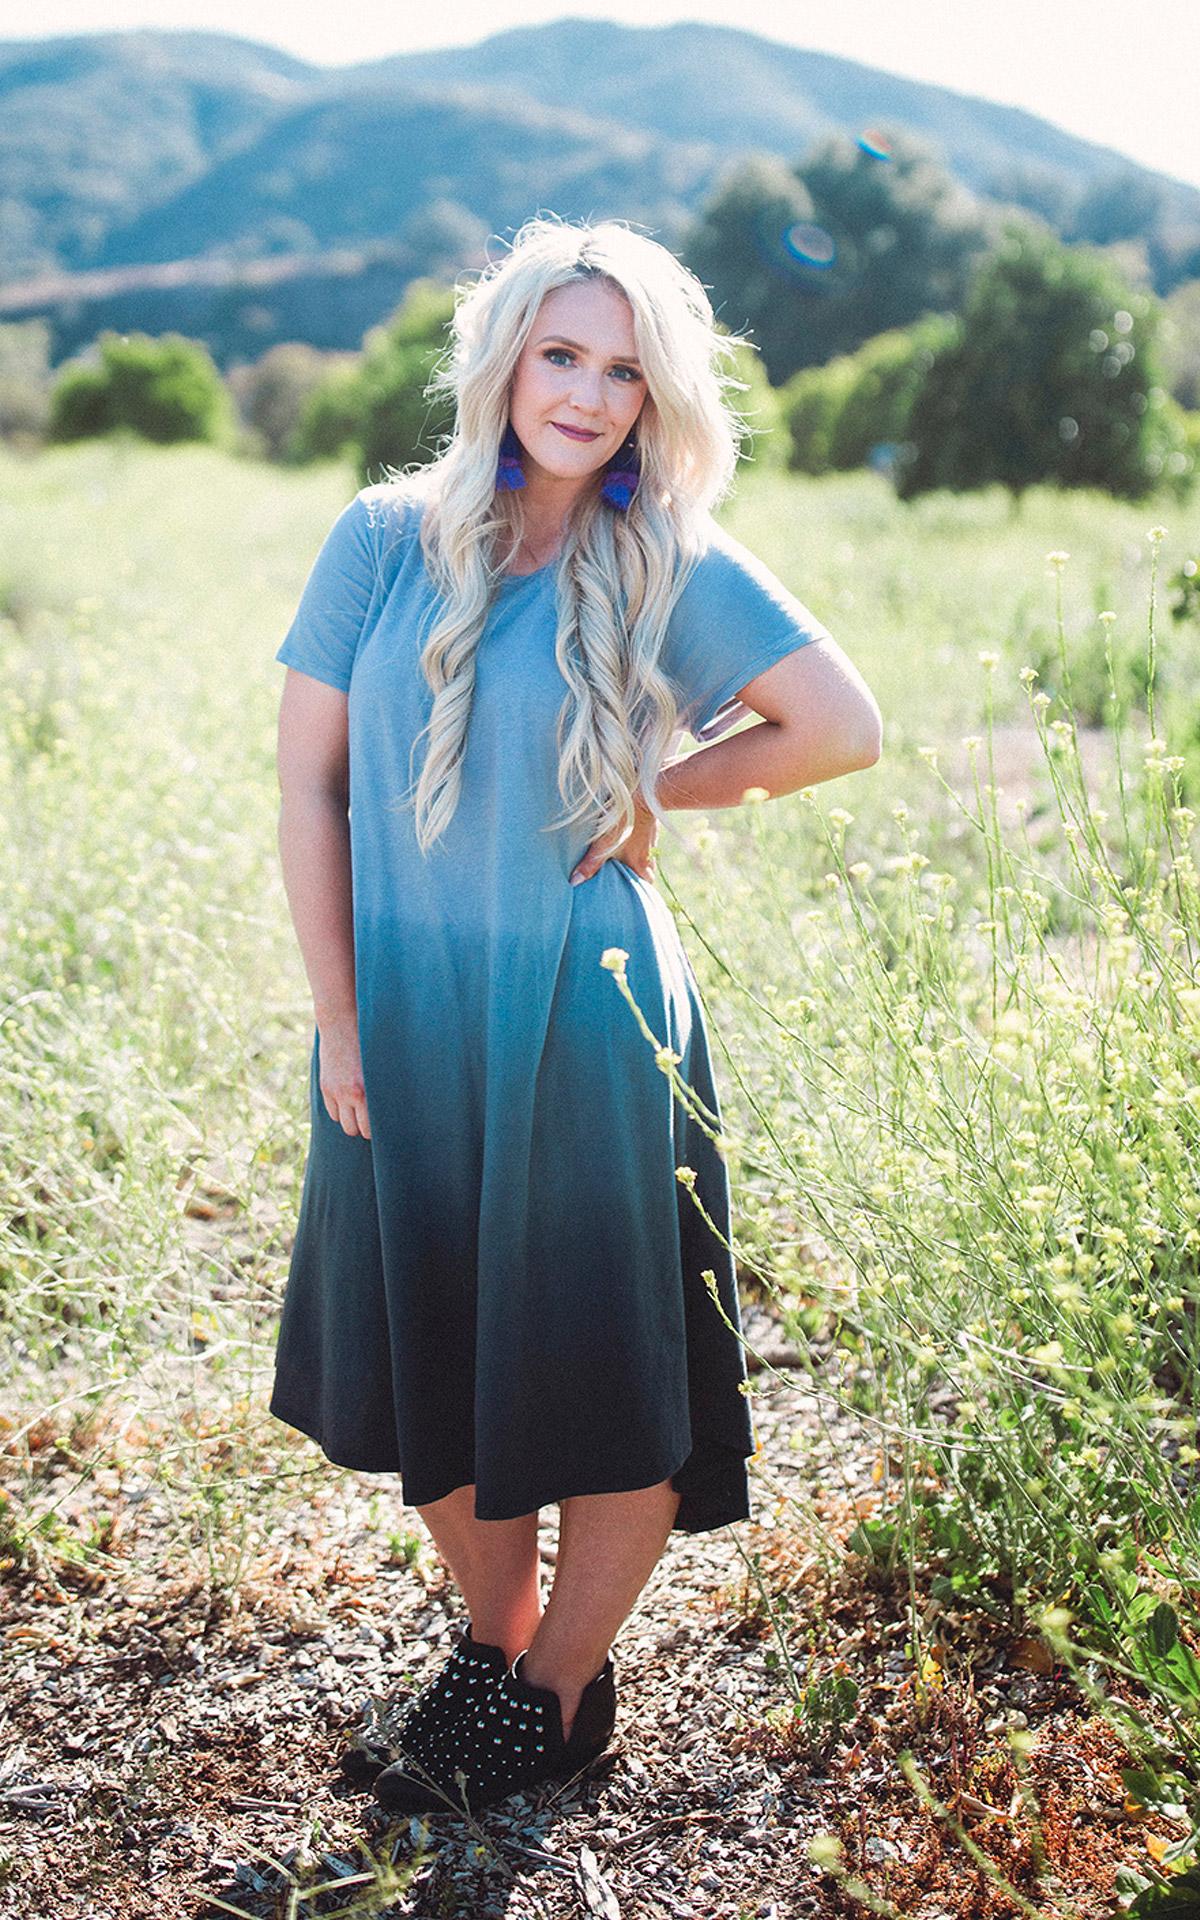 LuLaRoe-Carly-T-Shirt-High-Low-Dress-tie-dye-gradient.jpg